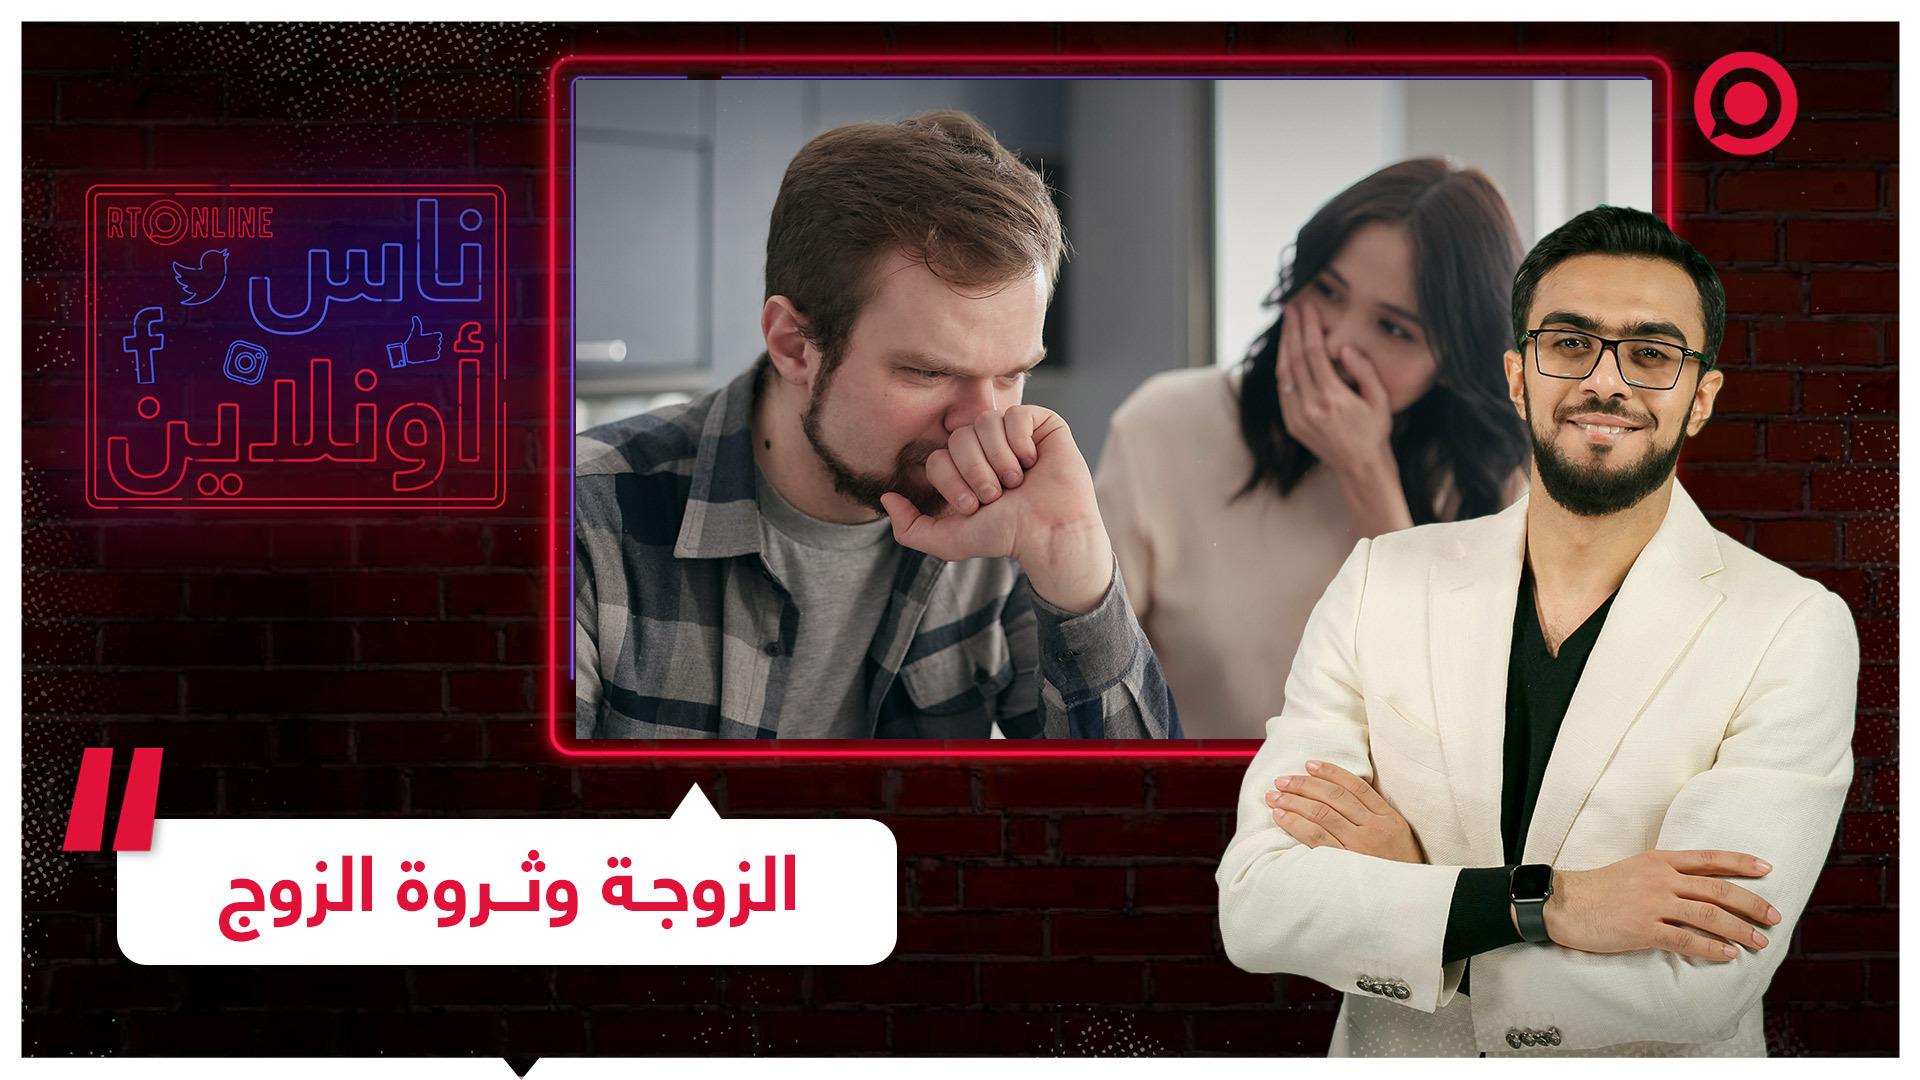 #زواج #طلاق #مصر #قانون